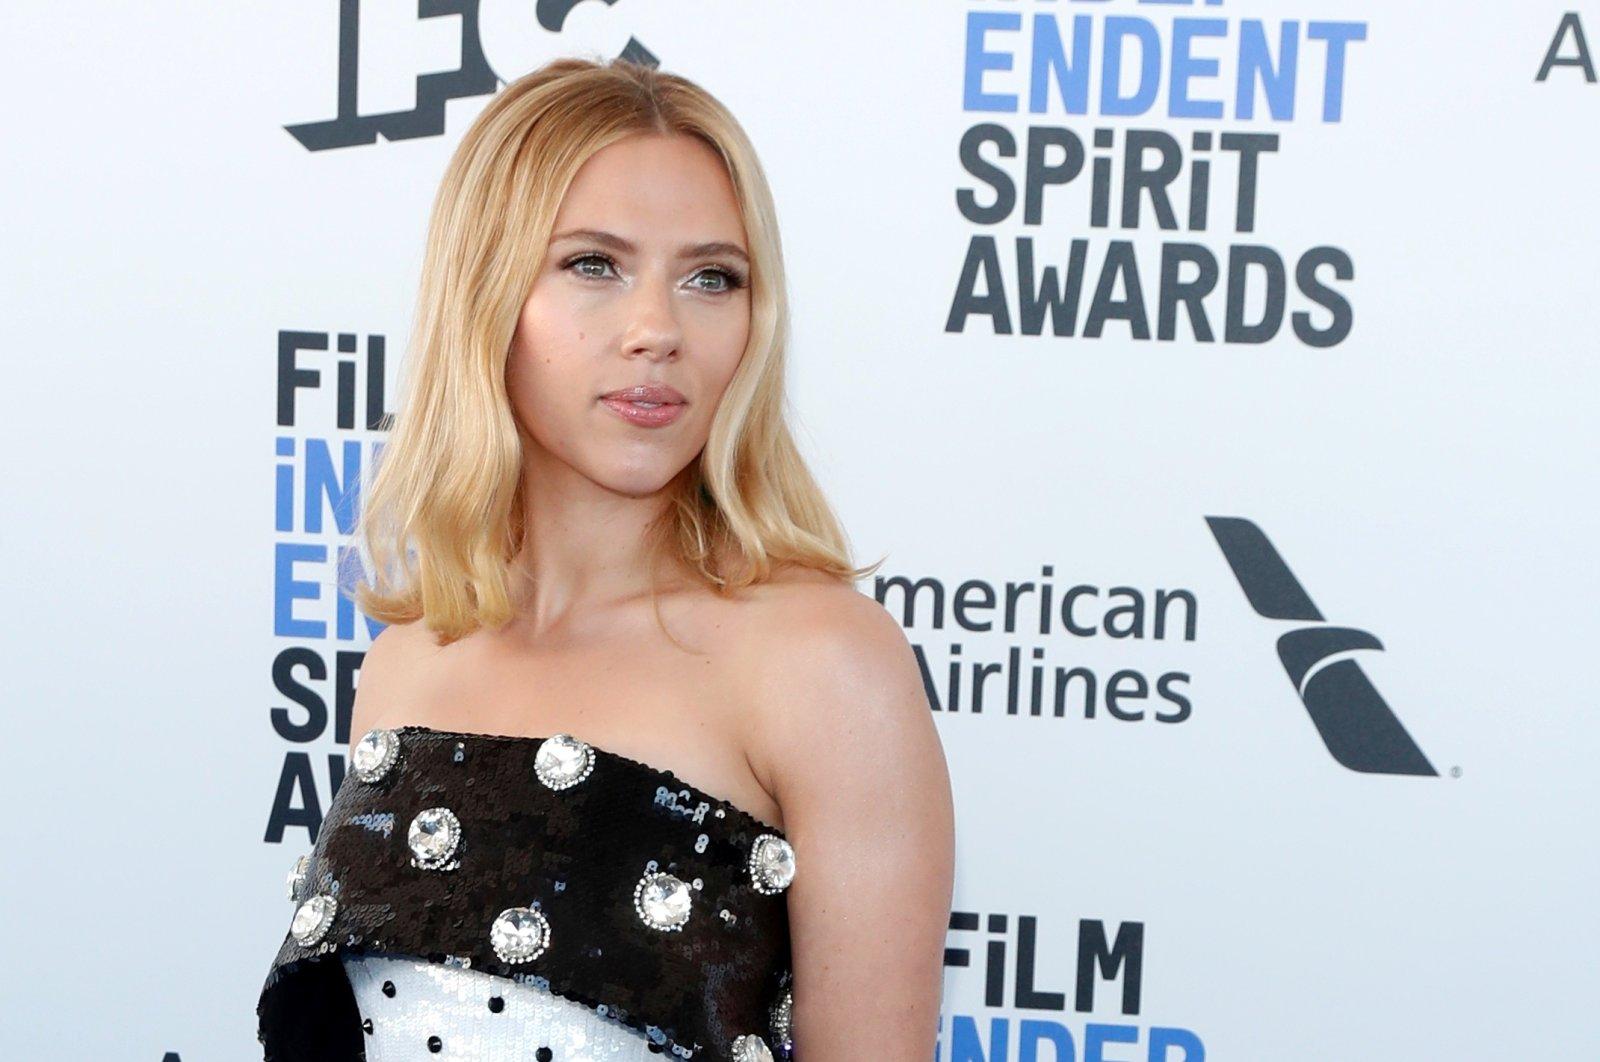 Actress Scarlett Johansson arrives at the35th Film Independent Spirit Awards in Santa Monica, California, U.S., Feb.8, 2020. (Reuters Photo)